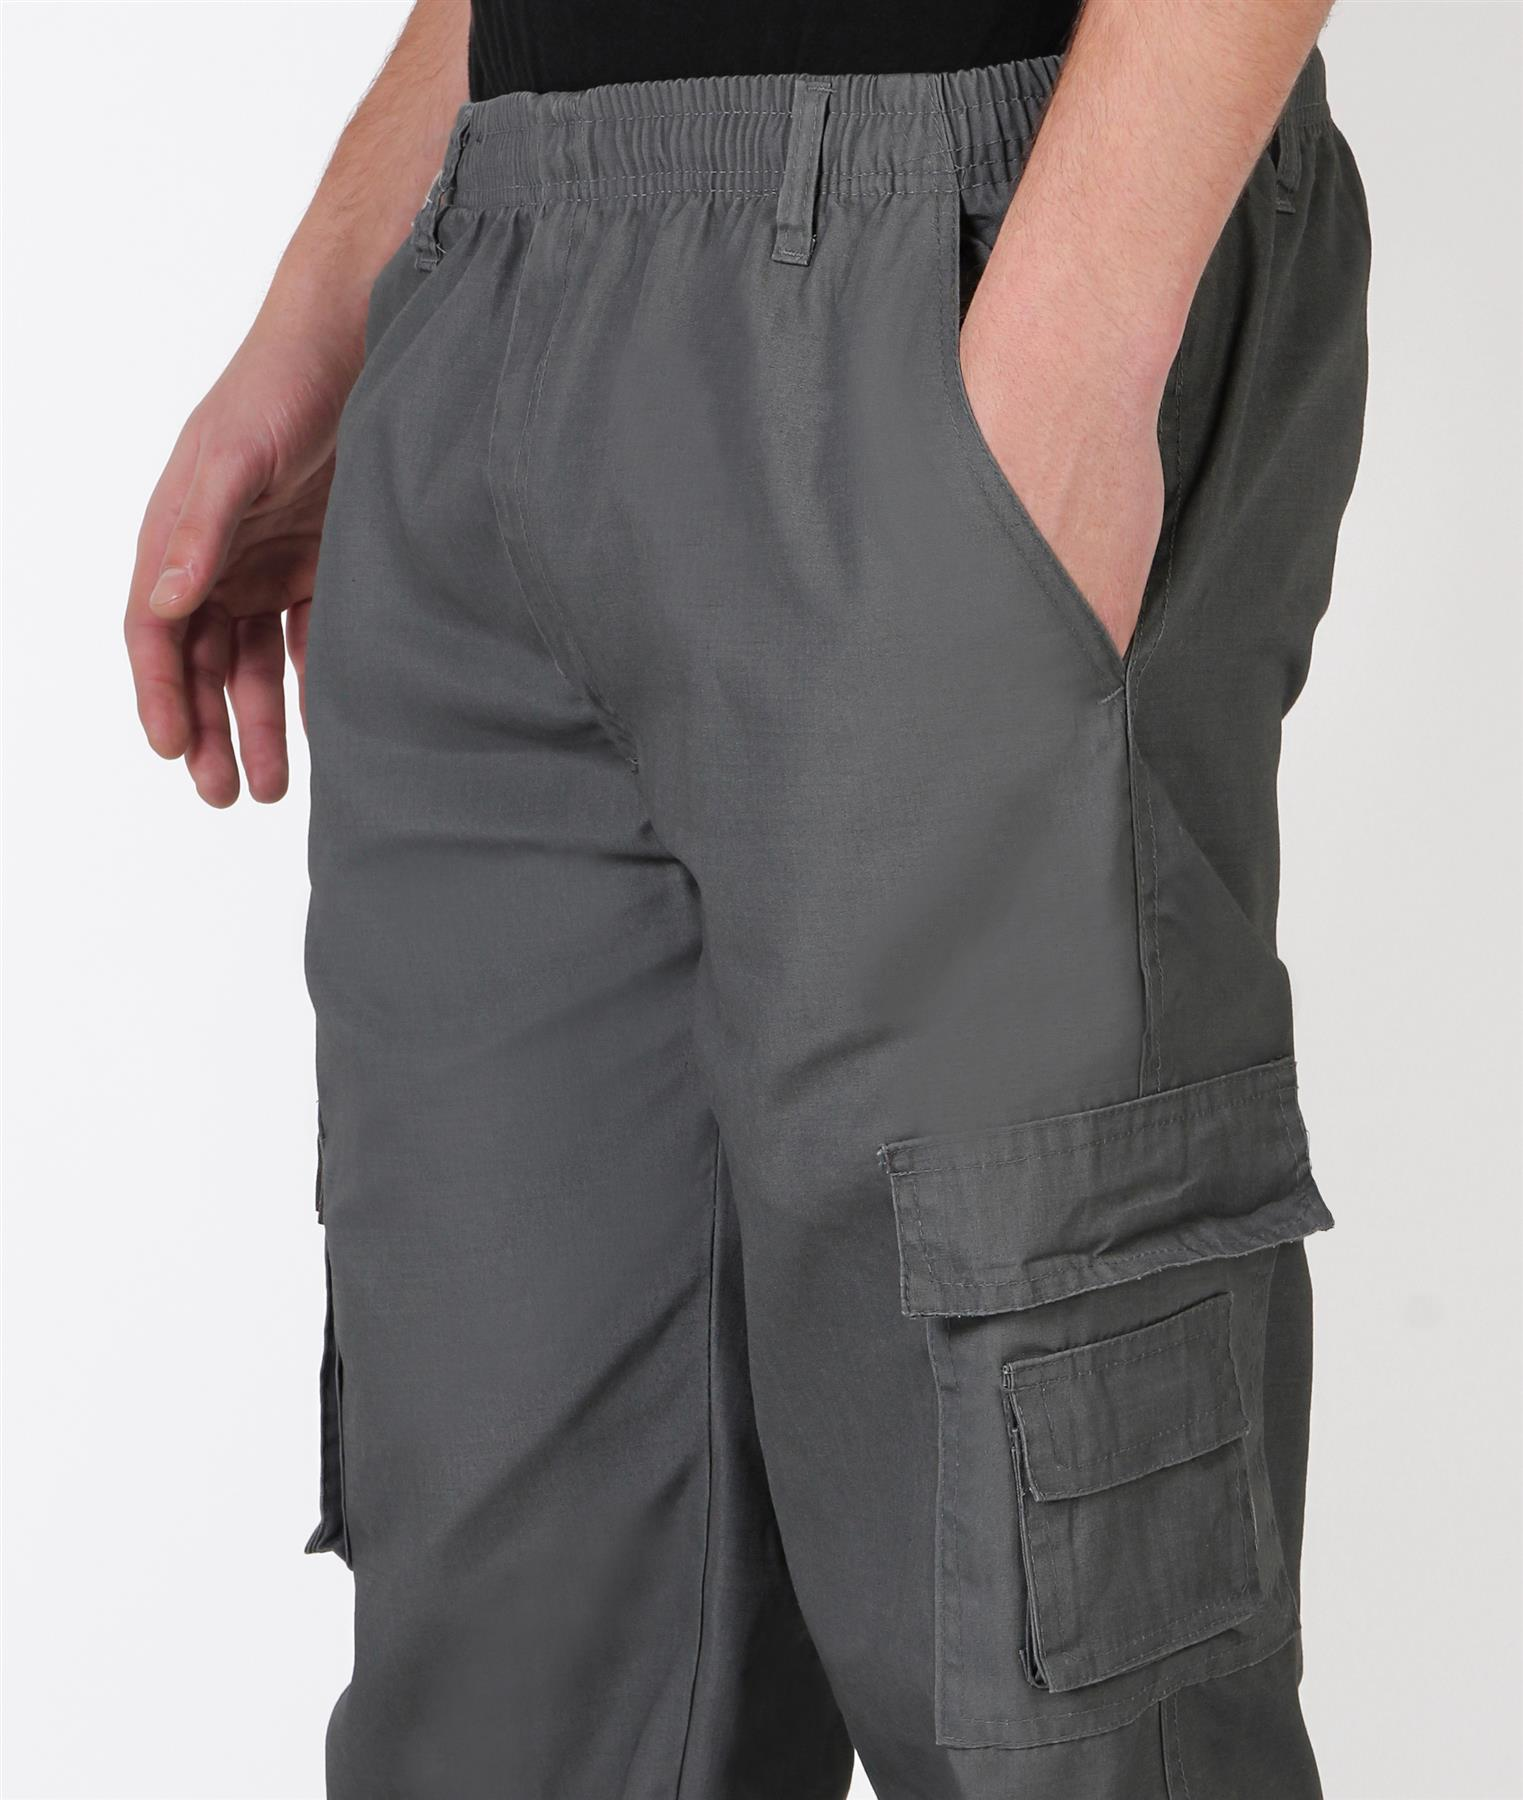 Pantalones-Hombre-Estilo-Cargo-Militar-Combate-Multibolsillos-Casual miniatura 21